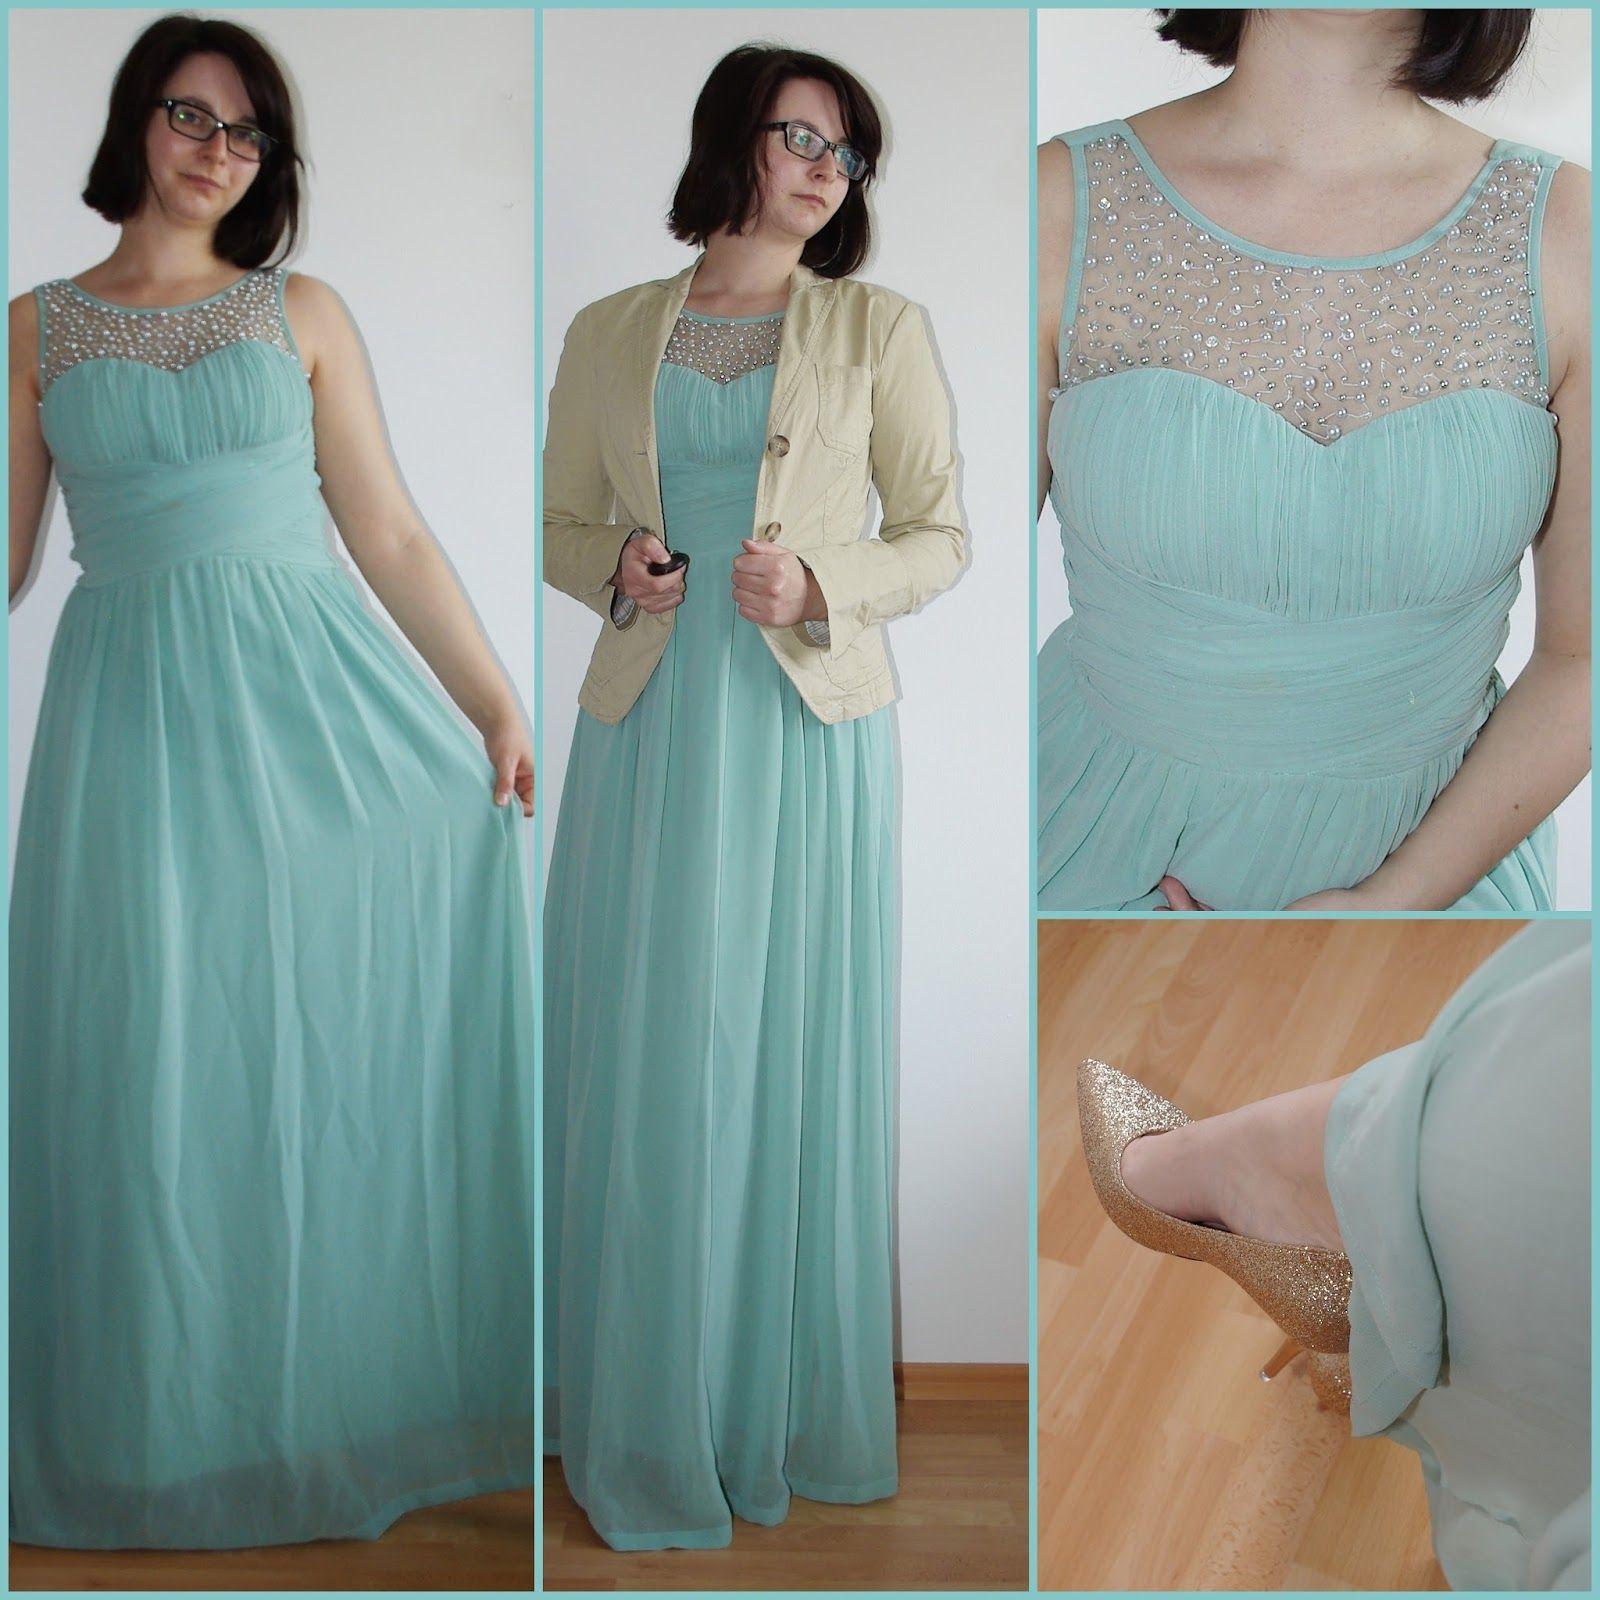 Fashion] Enchanted Embellished Mint Dress Mintfarbenes Abendkleid